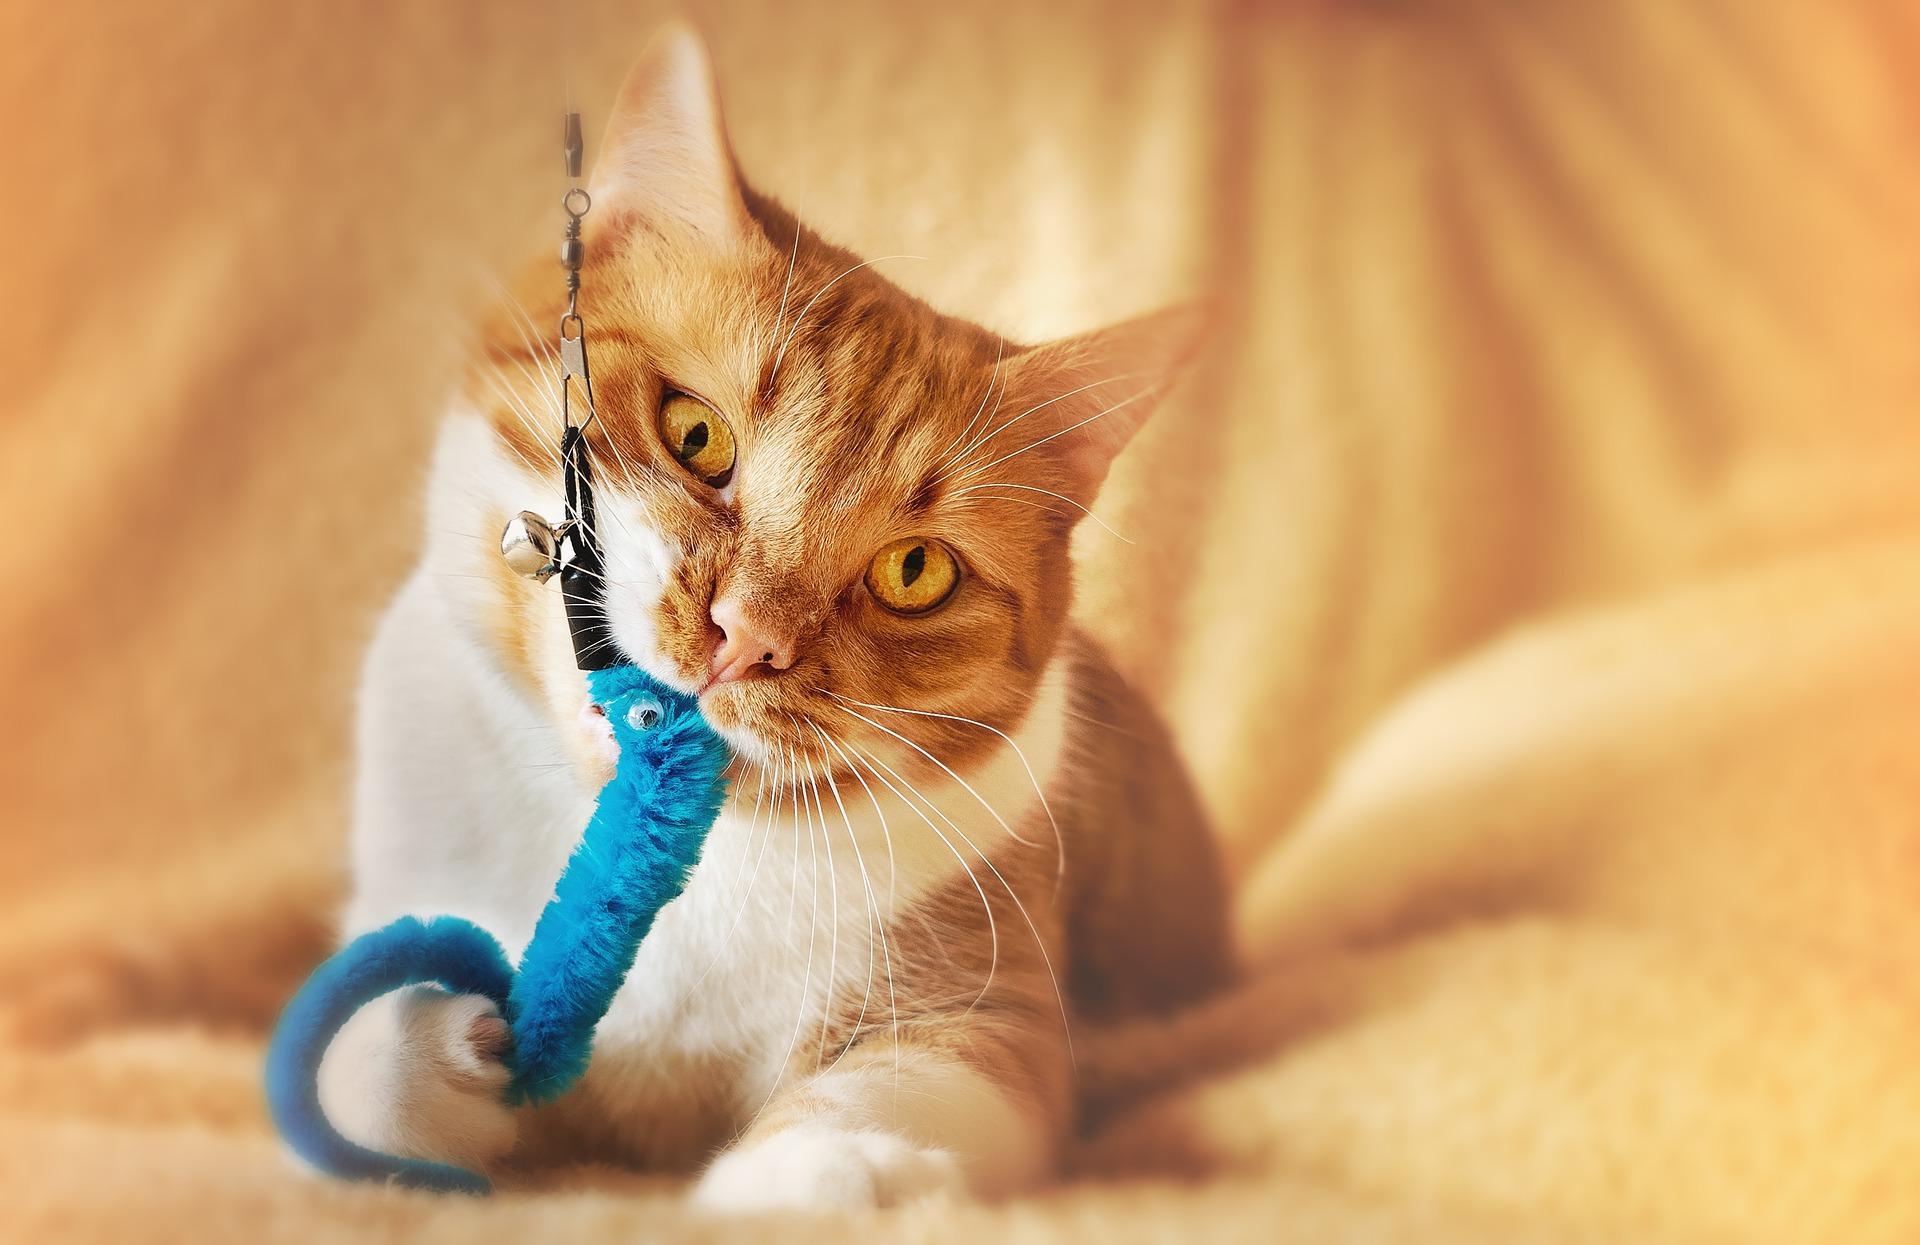 Katzenspielzeug Bio - Tolle Kaufideen.